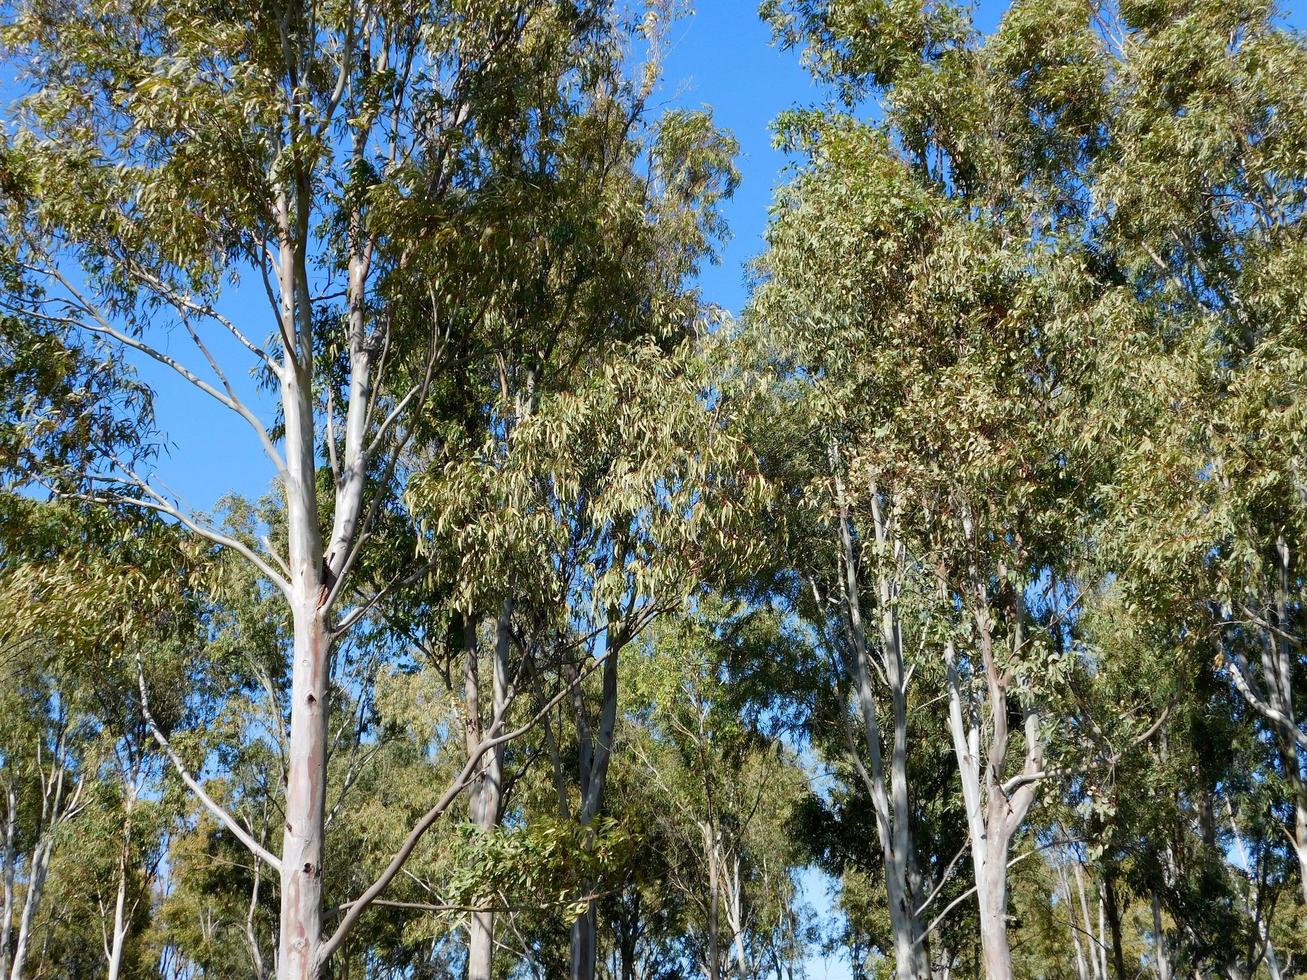 Trees against a clear blue sky photo